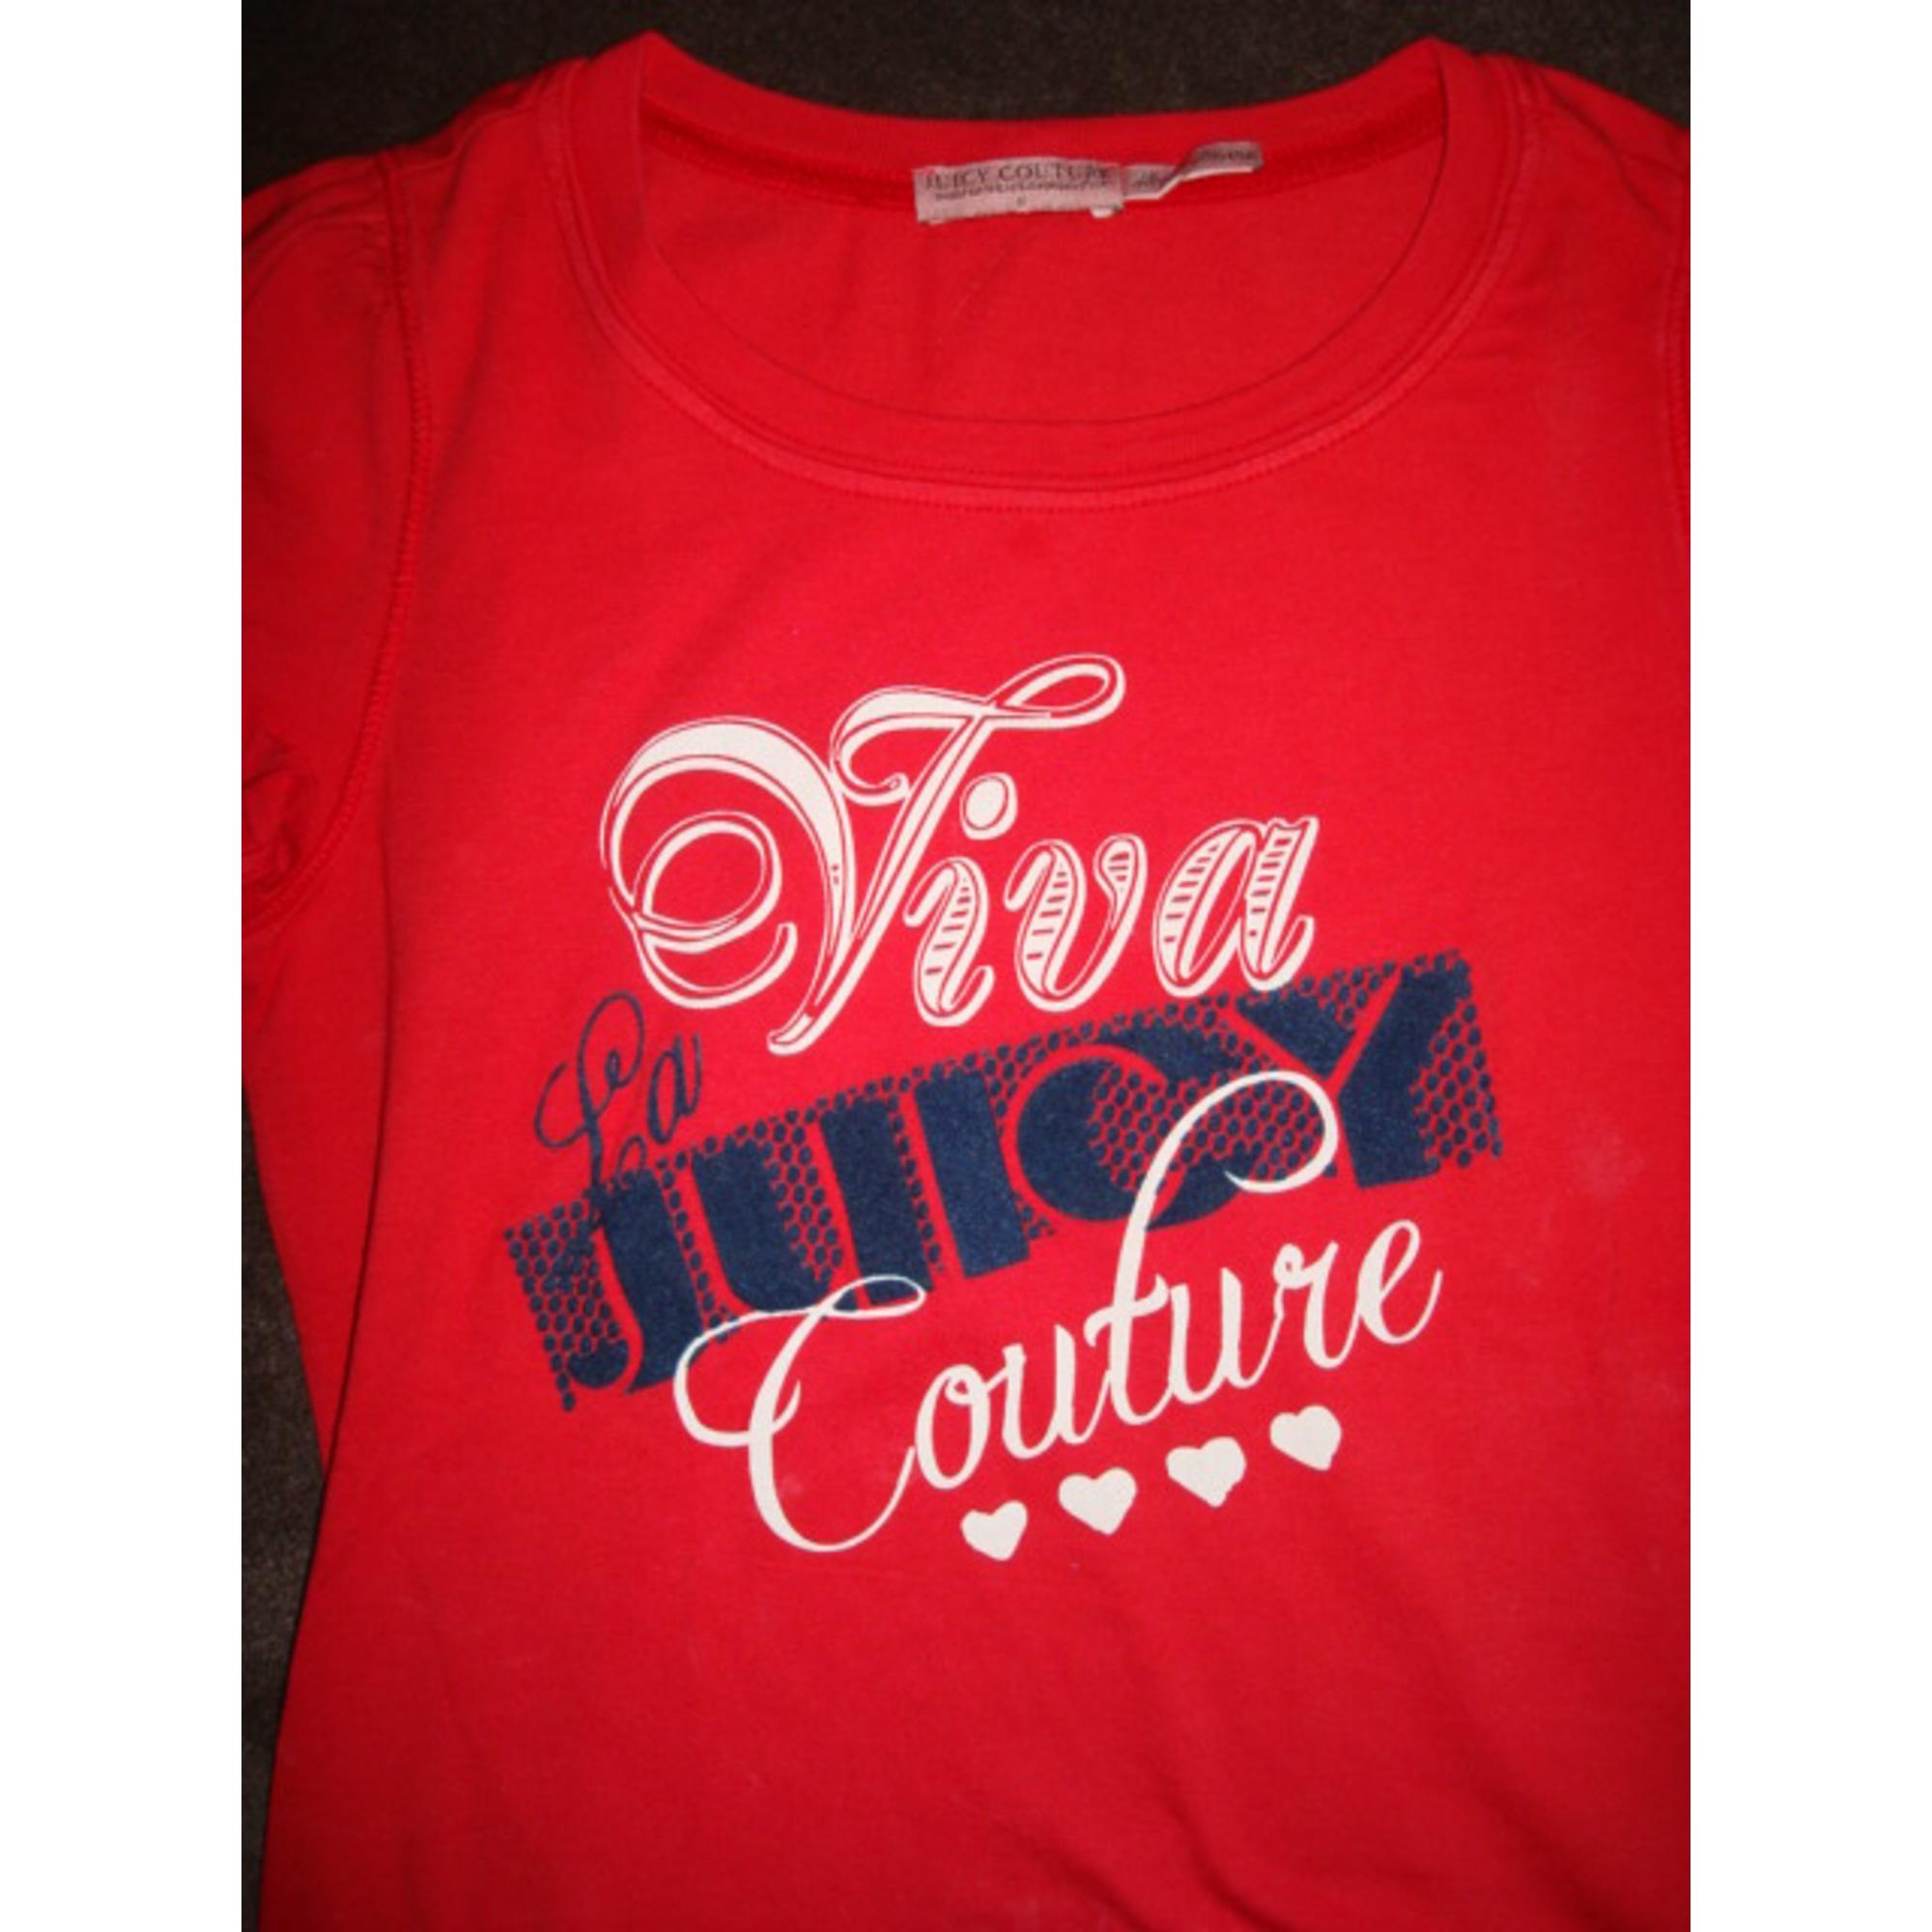 Top, Tee-shirt JUICY COUTURE Rouge, bordeaux